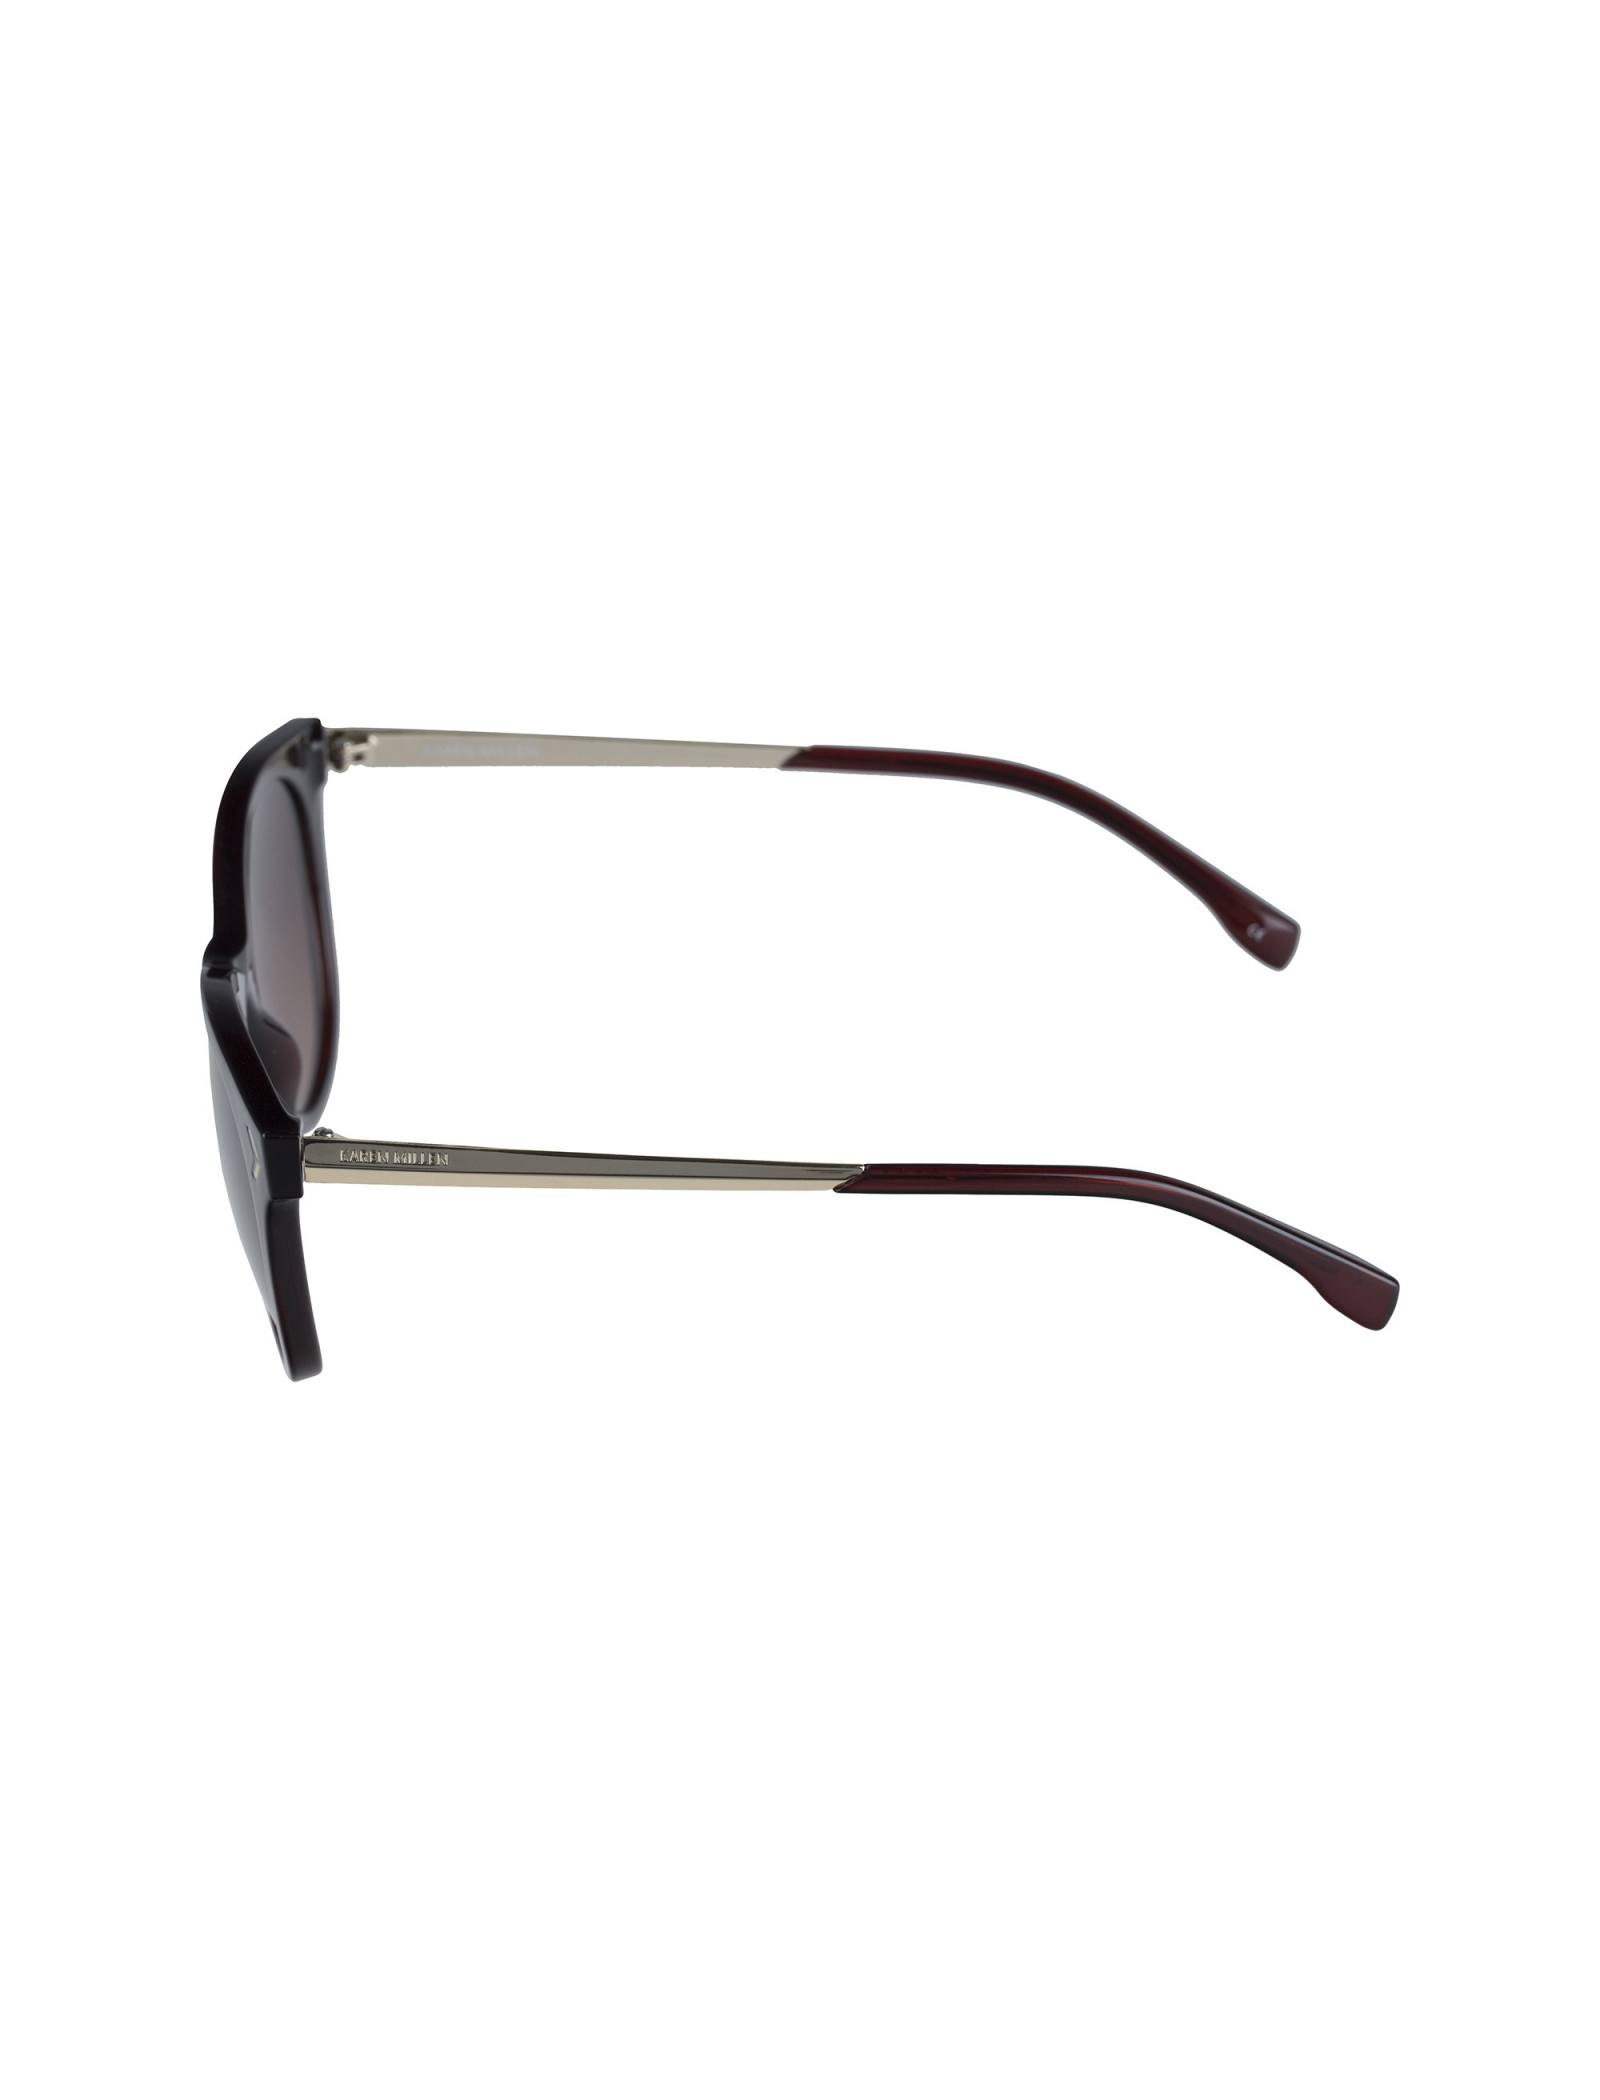 عینک آفتابی ویفرر زنانه - کارن میلن - قهوه اي - 4